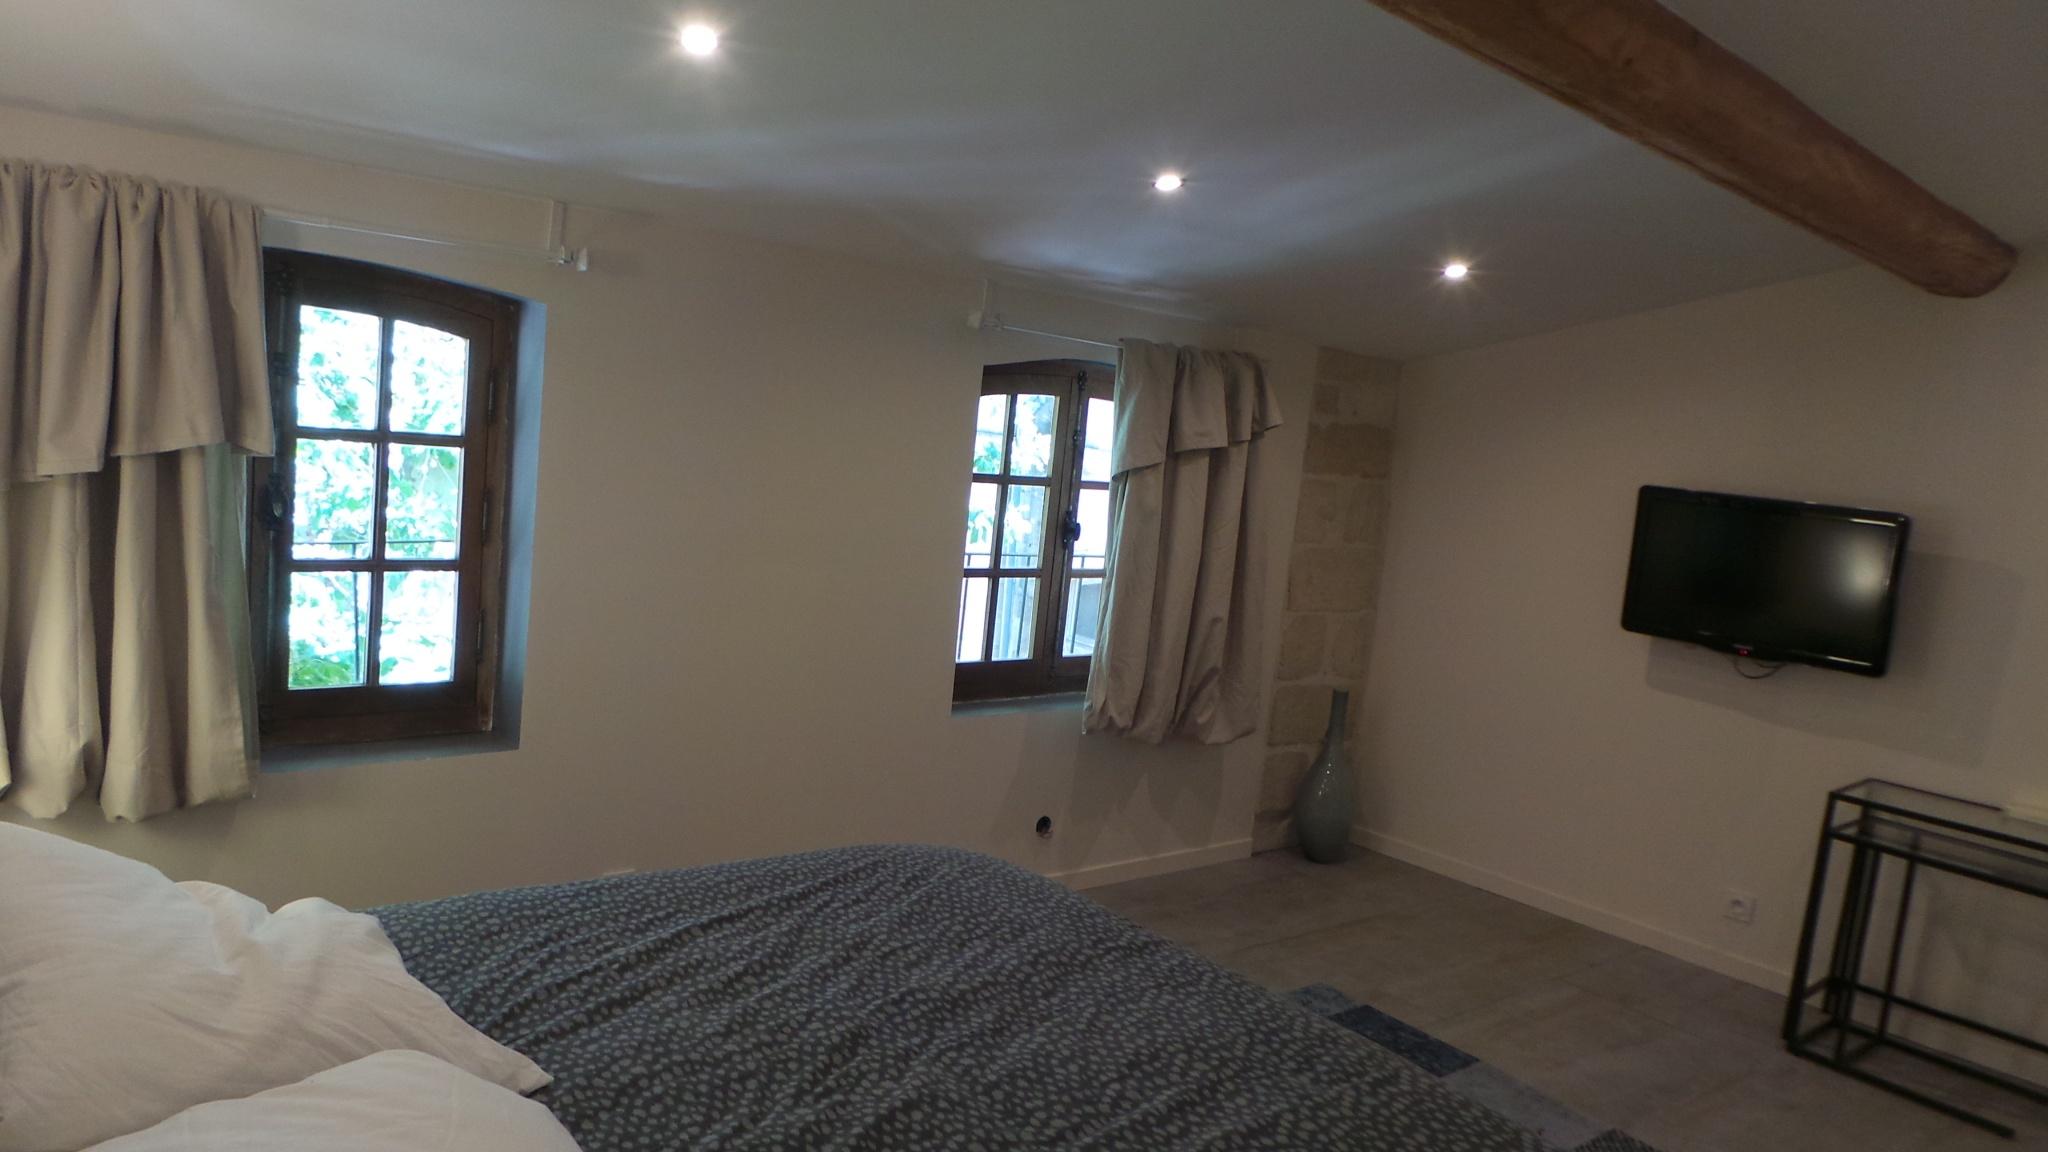 20160612 140006 la chambre des petits papes. Black Bedroom Furniture Sets. Home Design Ideas